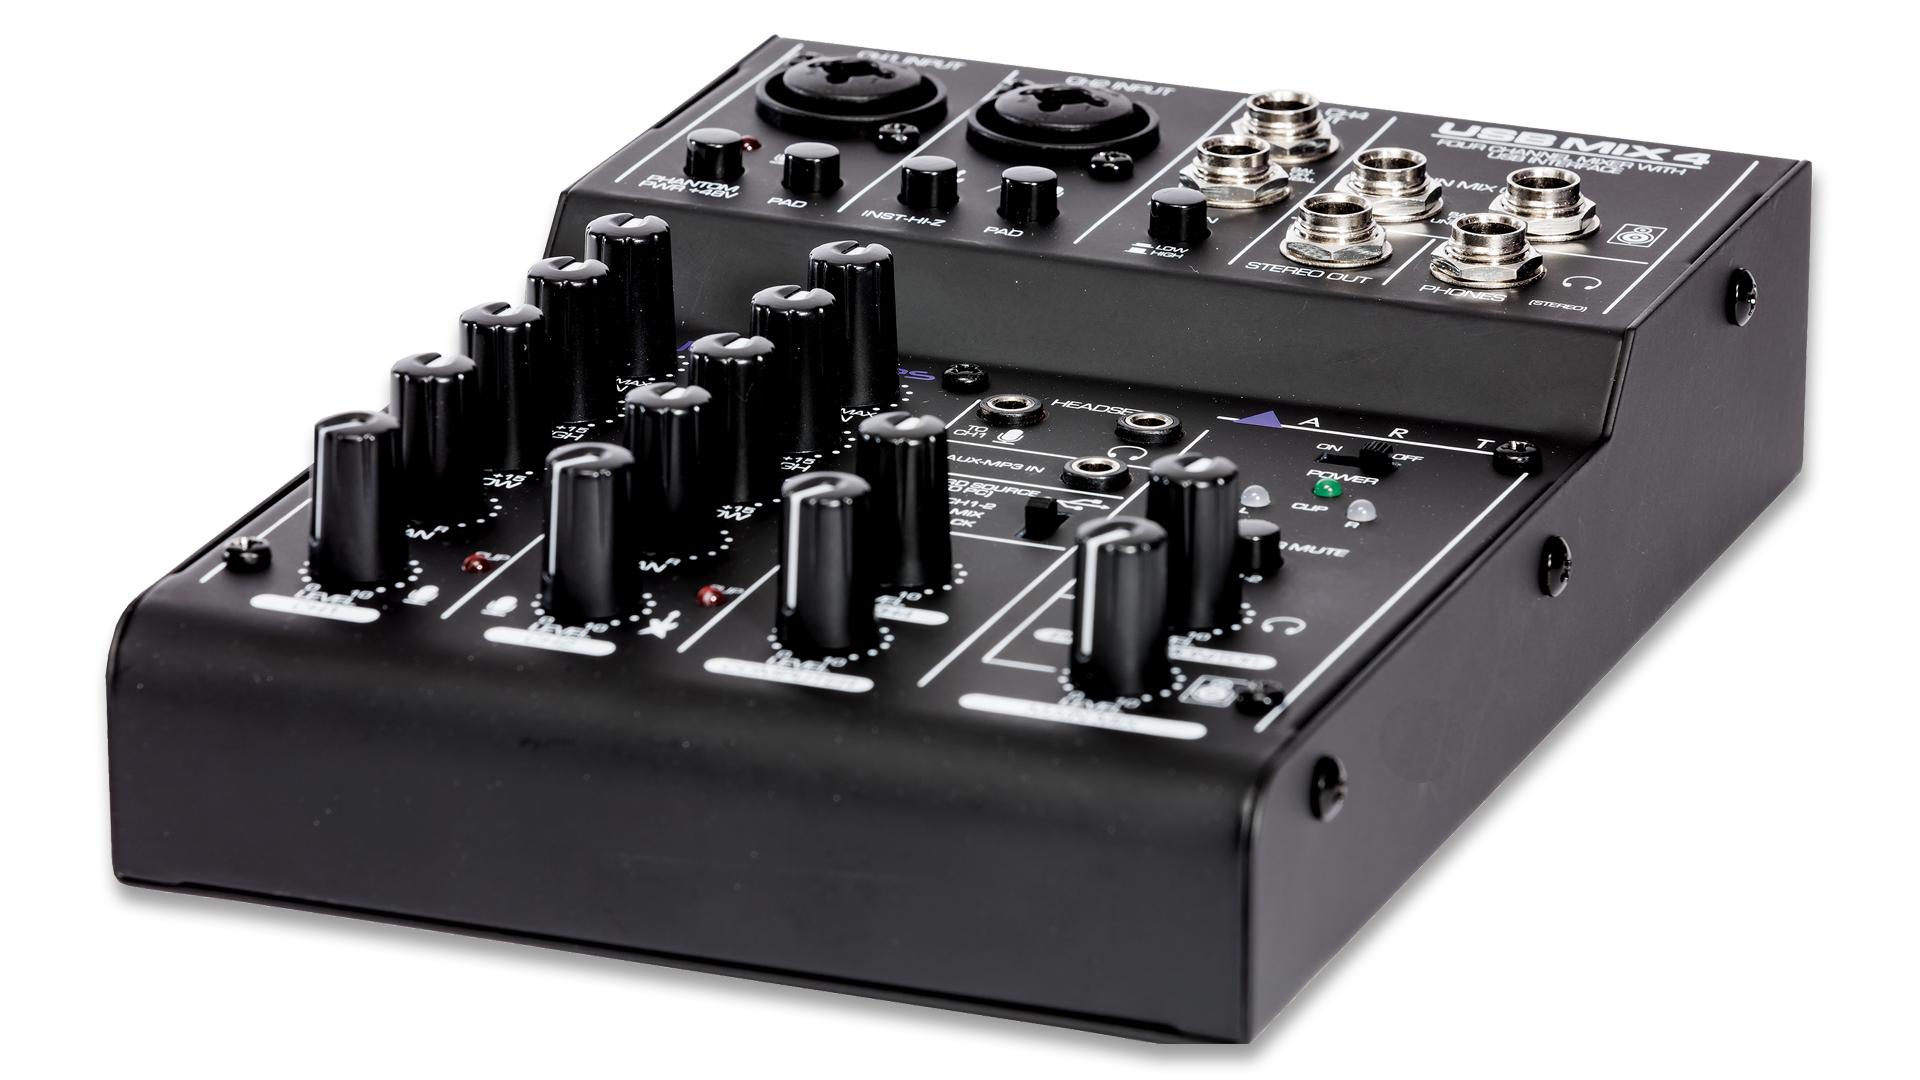 usbmix4 four channel mixer usb audio interface art pro audio. Black Bedroom Furniture Sets. Home Design Ideas